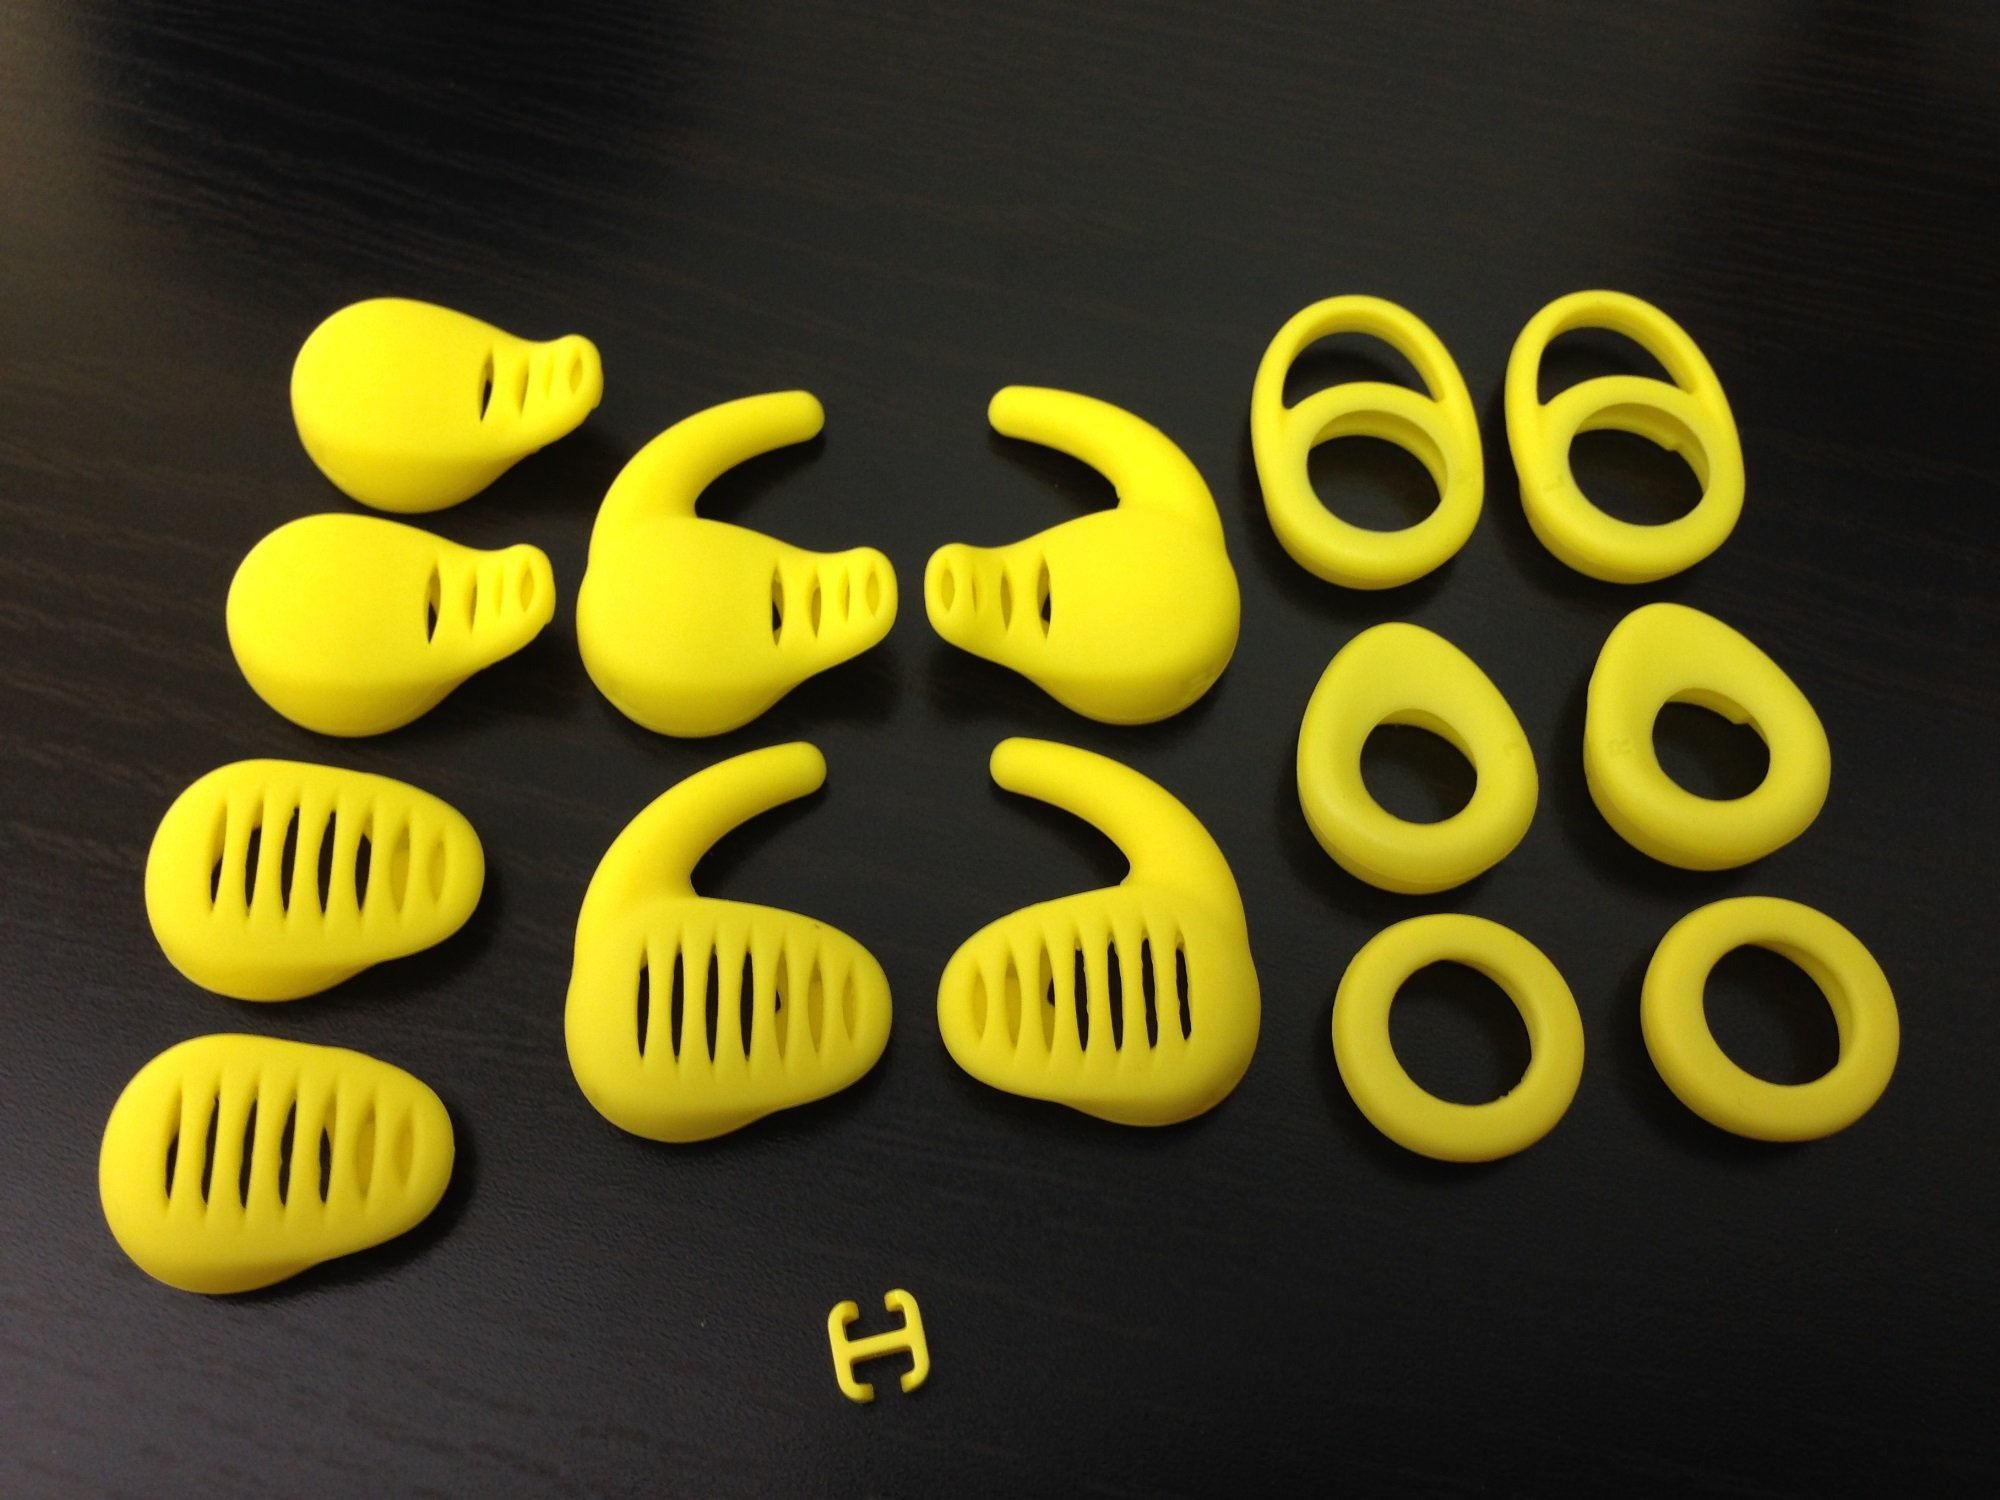 تنظیم OEM 14 EarGels و 1 FitClip برای Jabra Sport Wireless Jabra Sport Jabra هدست بلوتوث گوش جوانه های گوش برای استابلایزر Eargels Earbuds Eartips Earstabilizer تعویض